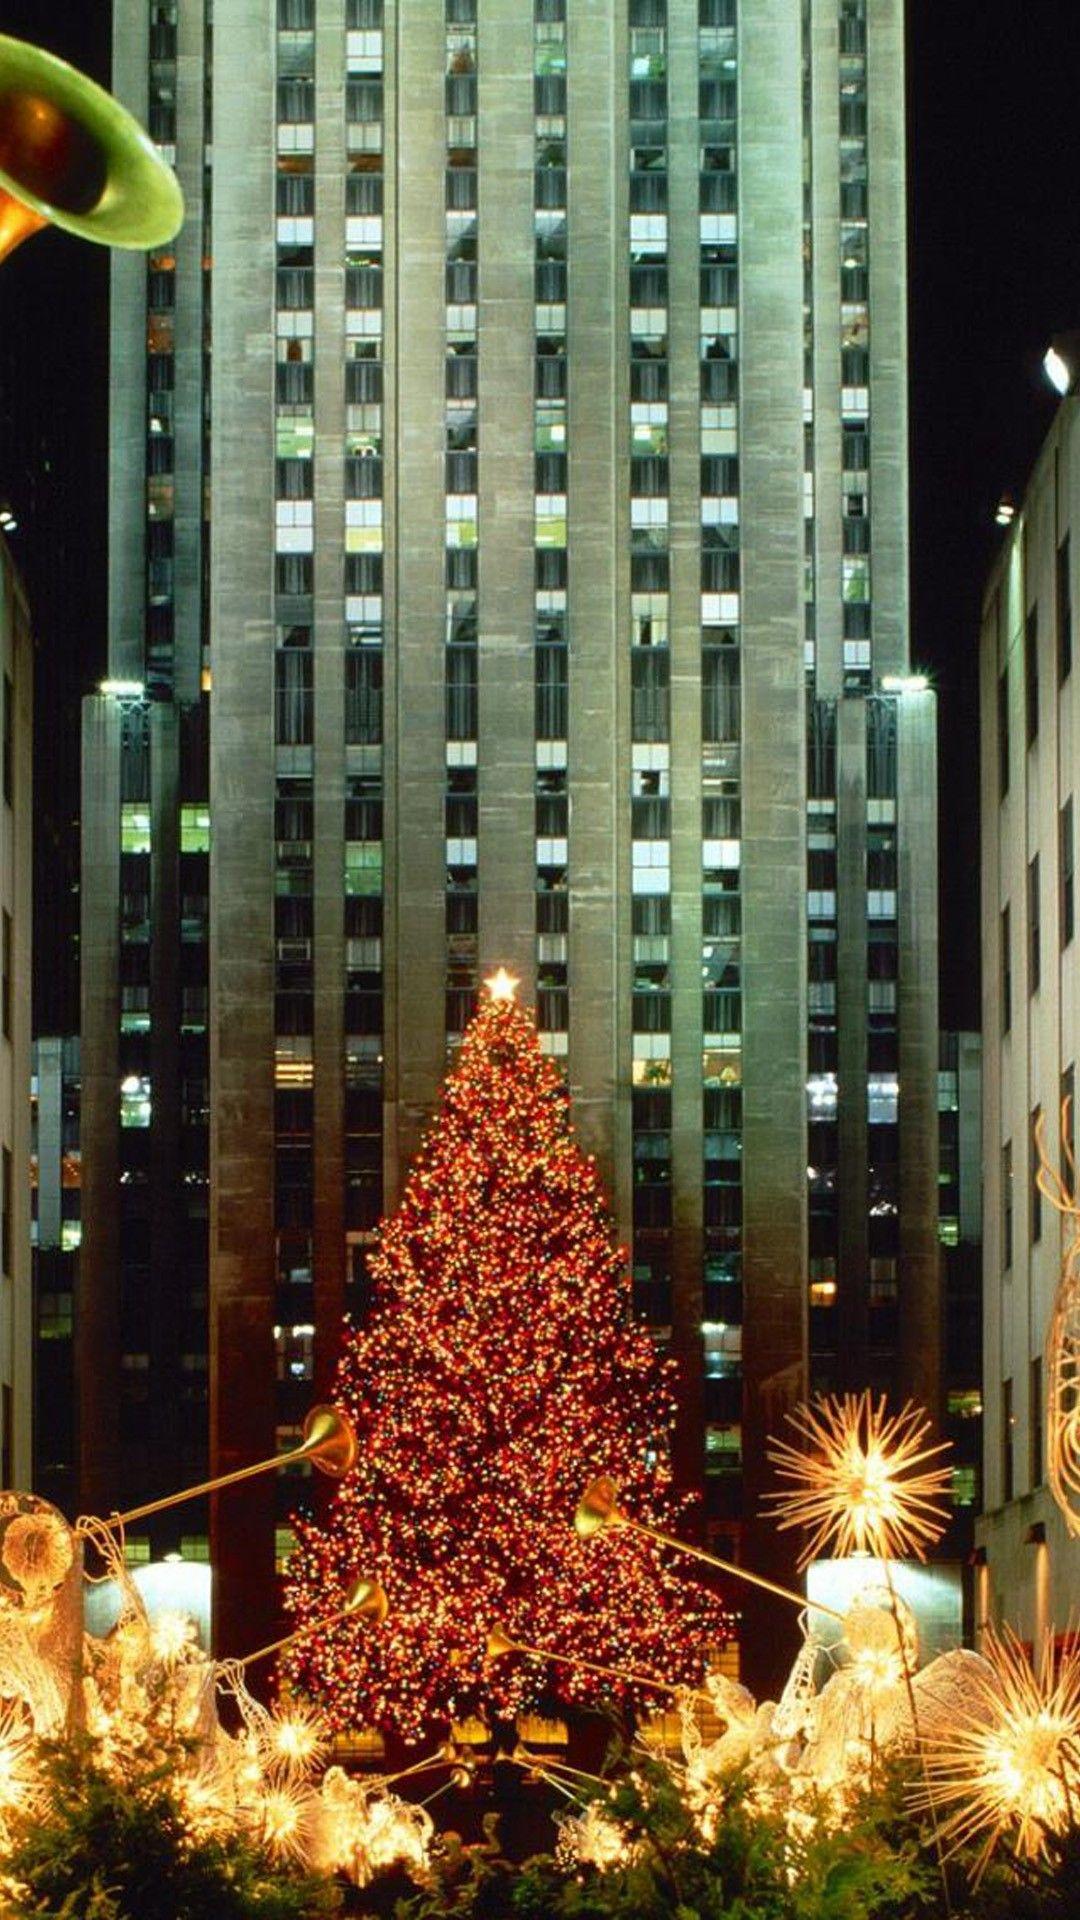 Christmas In New York Tree Lights Phone Wallpaper Hd Check More At Https Phonewallp Com Christmas Christmas Lights Wallpaper Lit Wallpaper New York Wallpaper